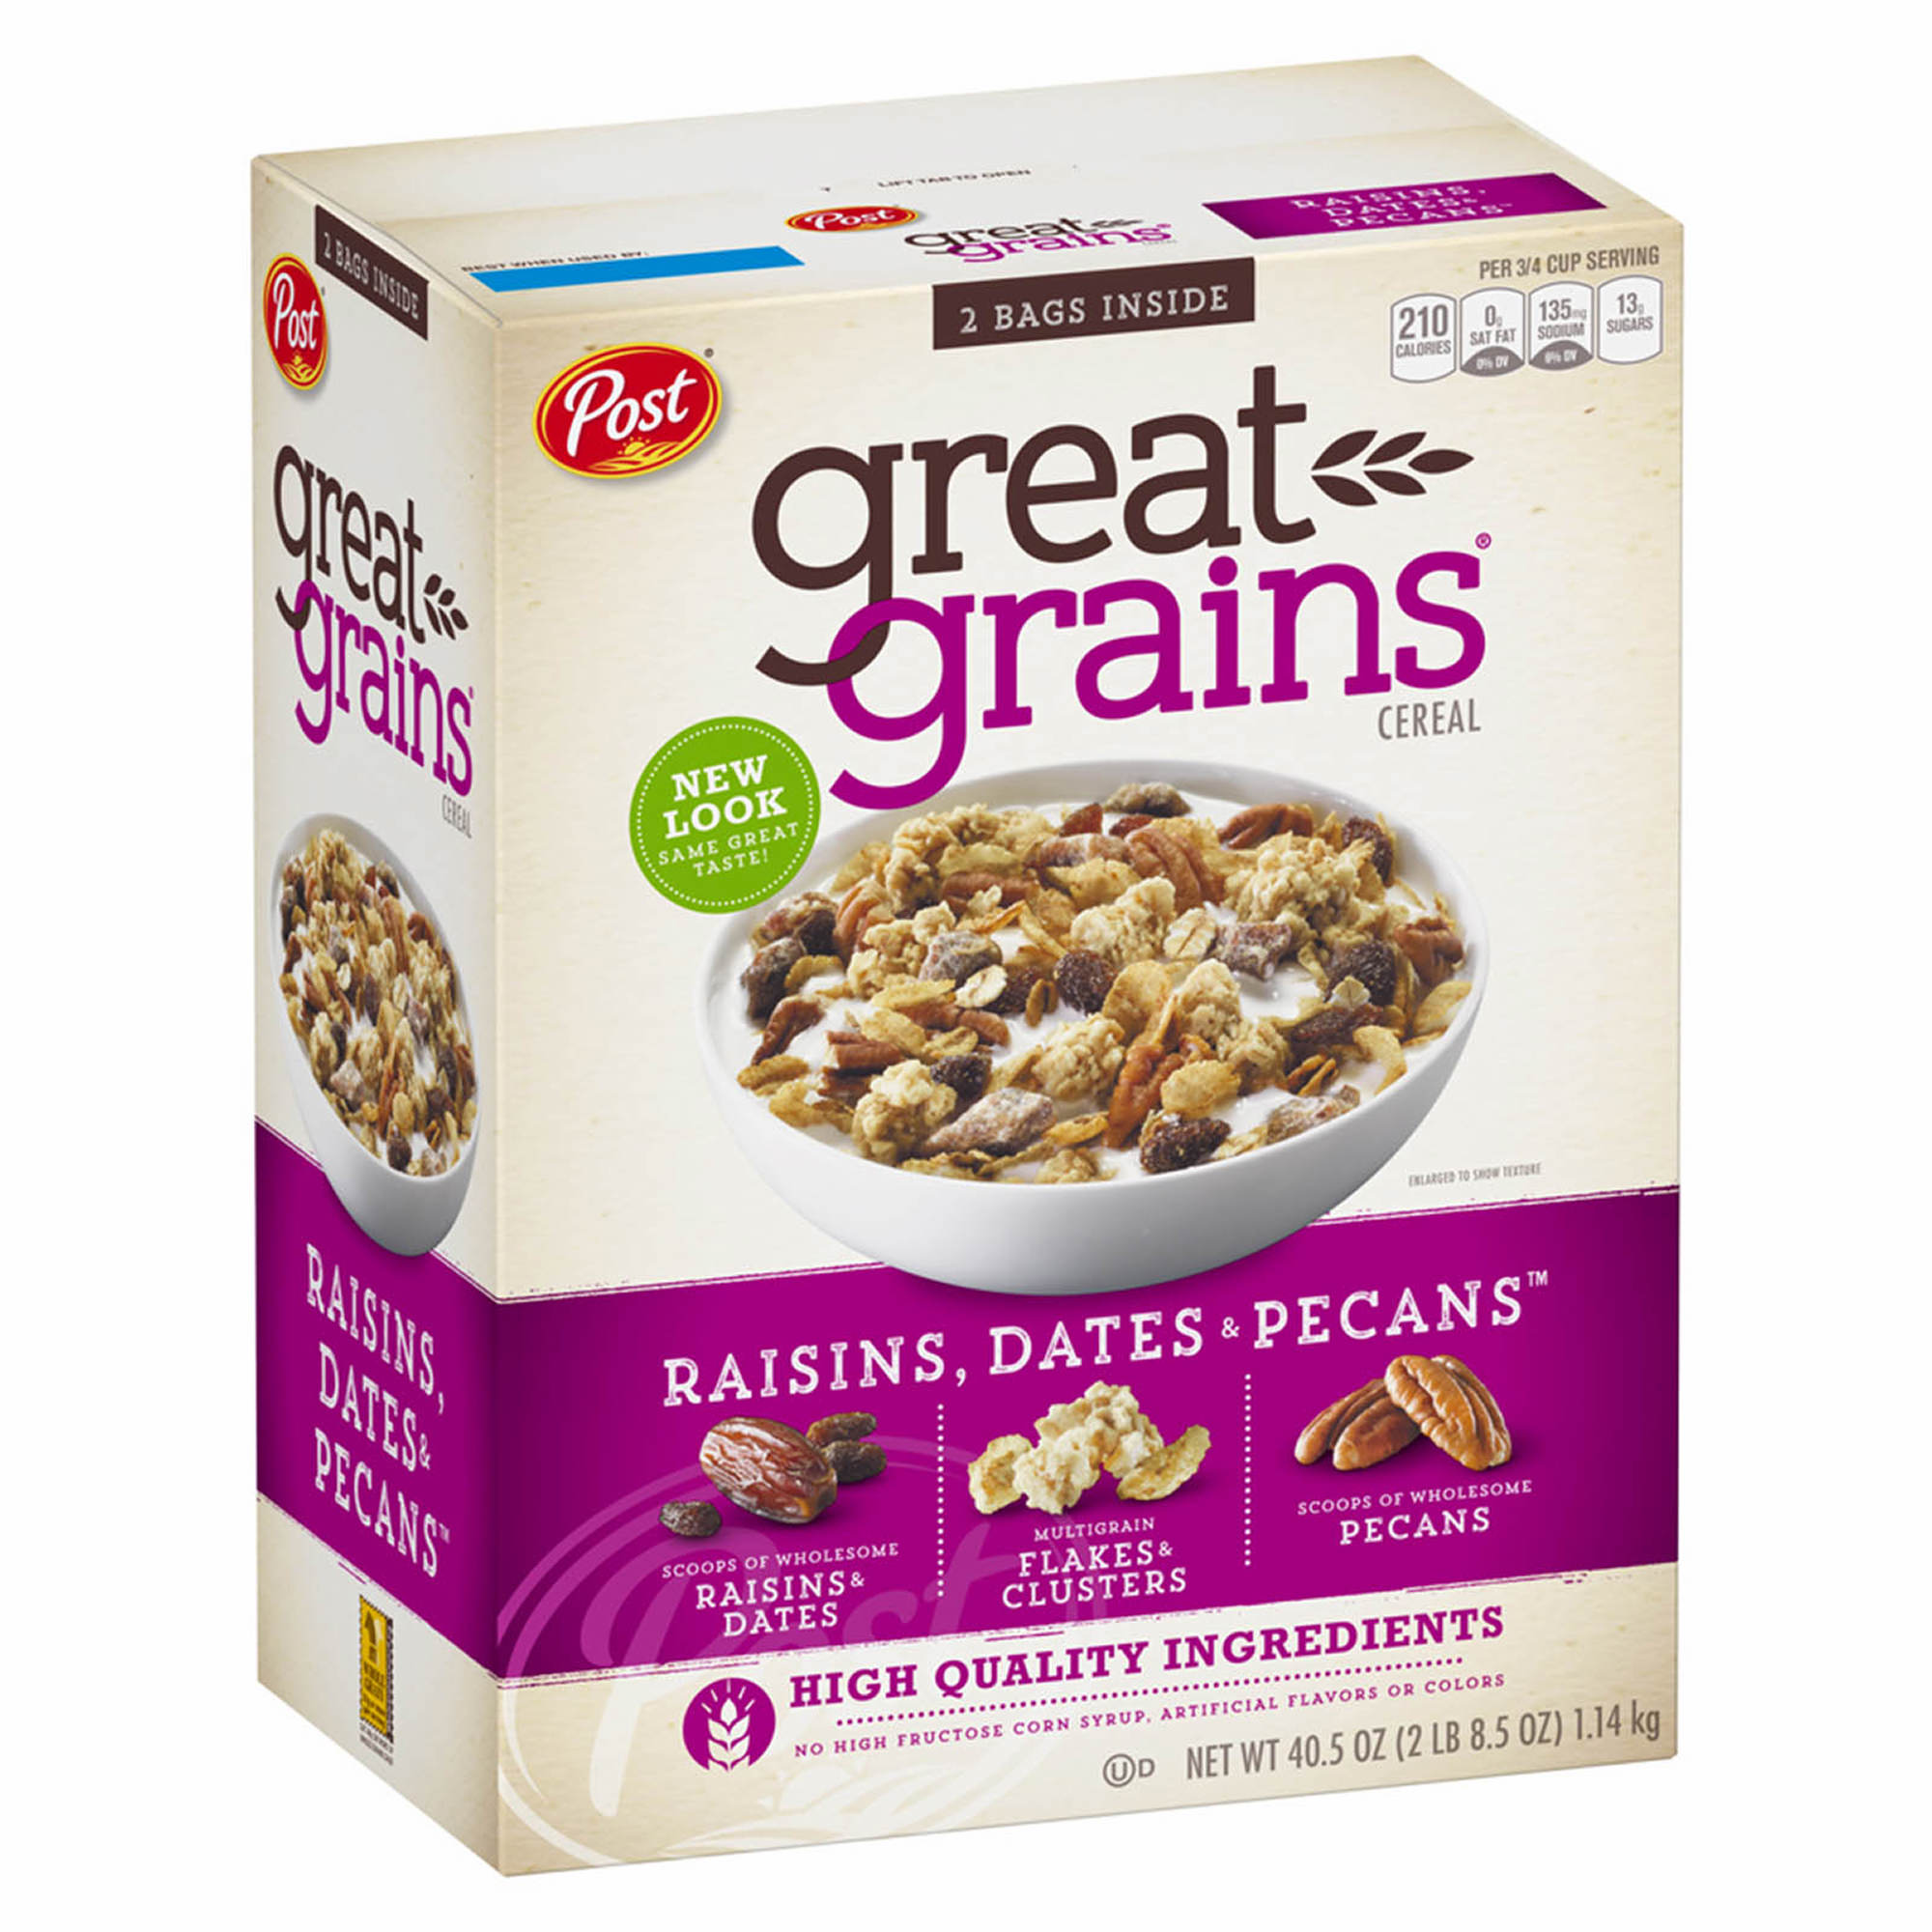 Post Great Grains Raisins, Dates And Pecans, 40.5 Oz.